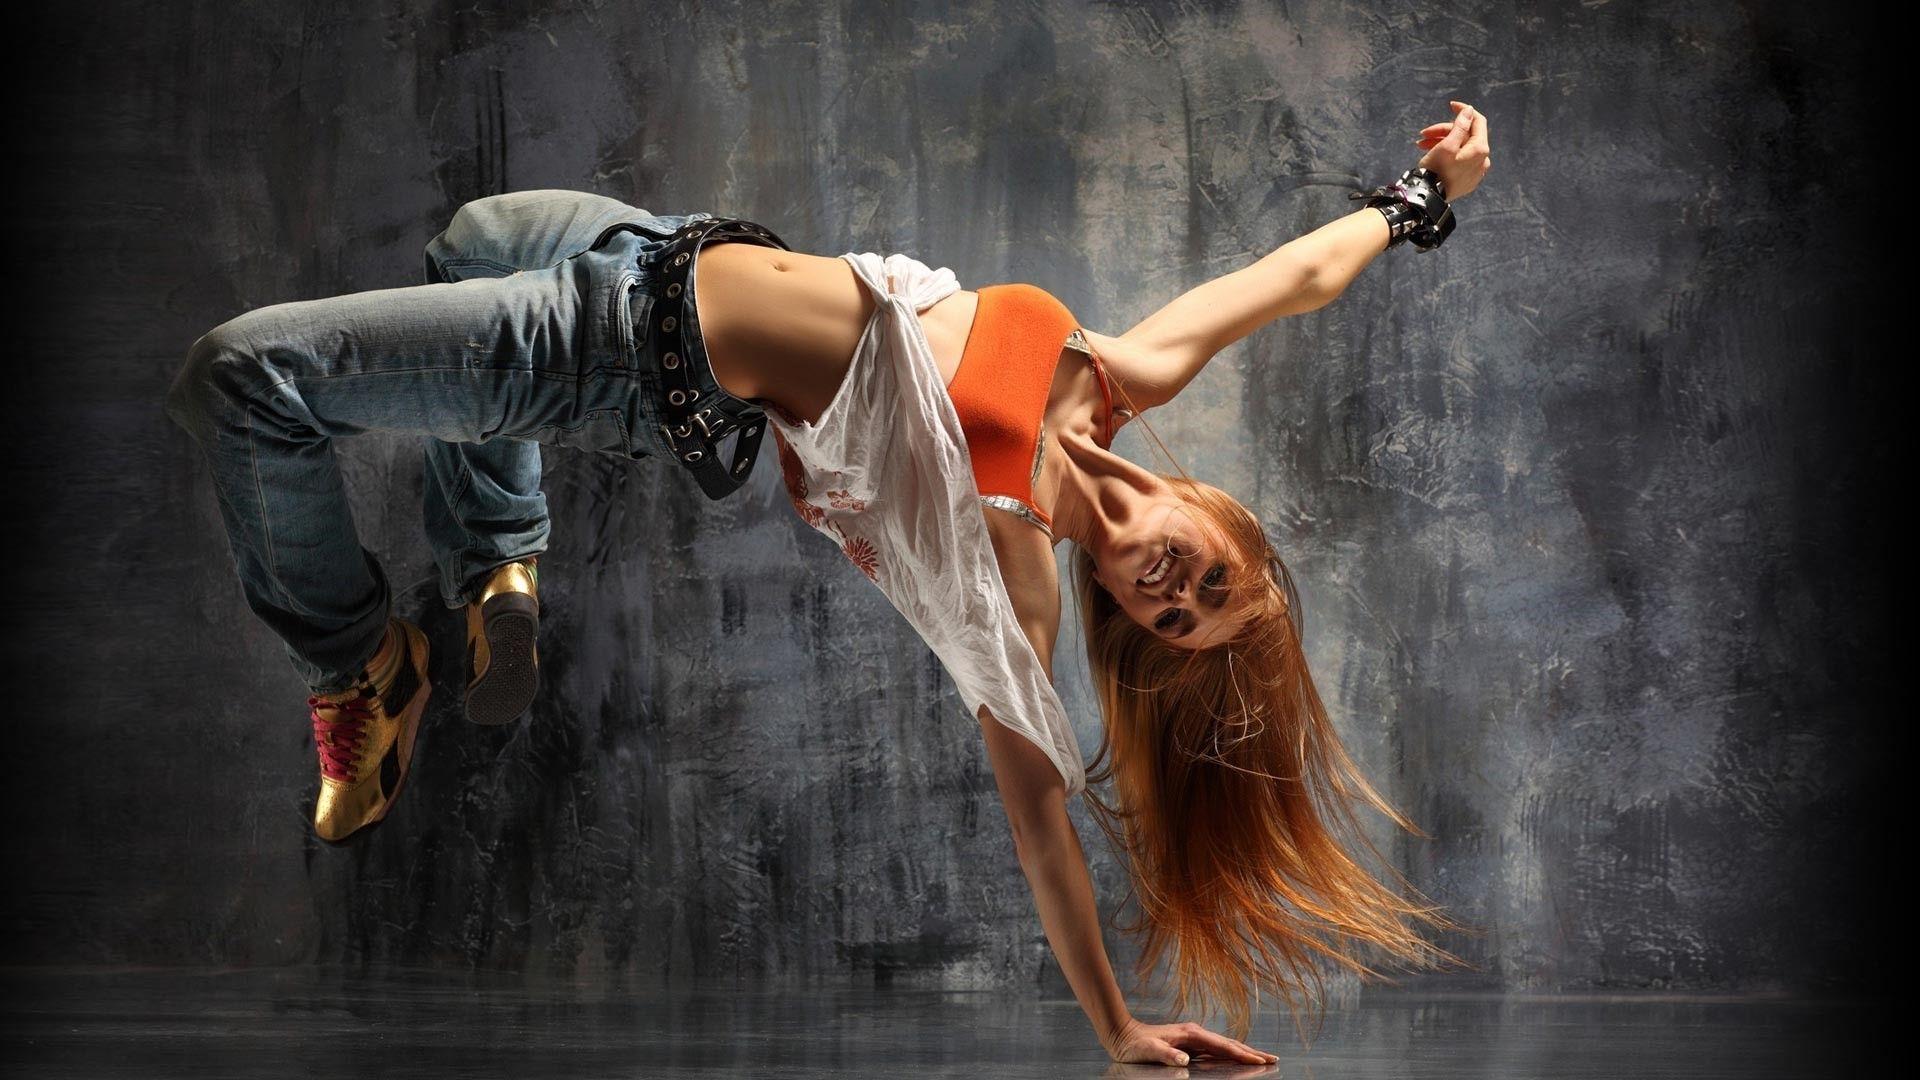 Nøgne Hot Piger Danse